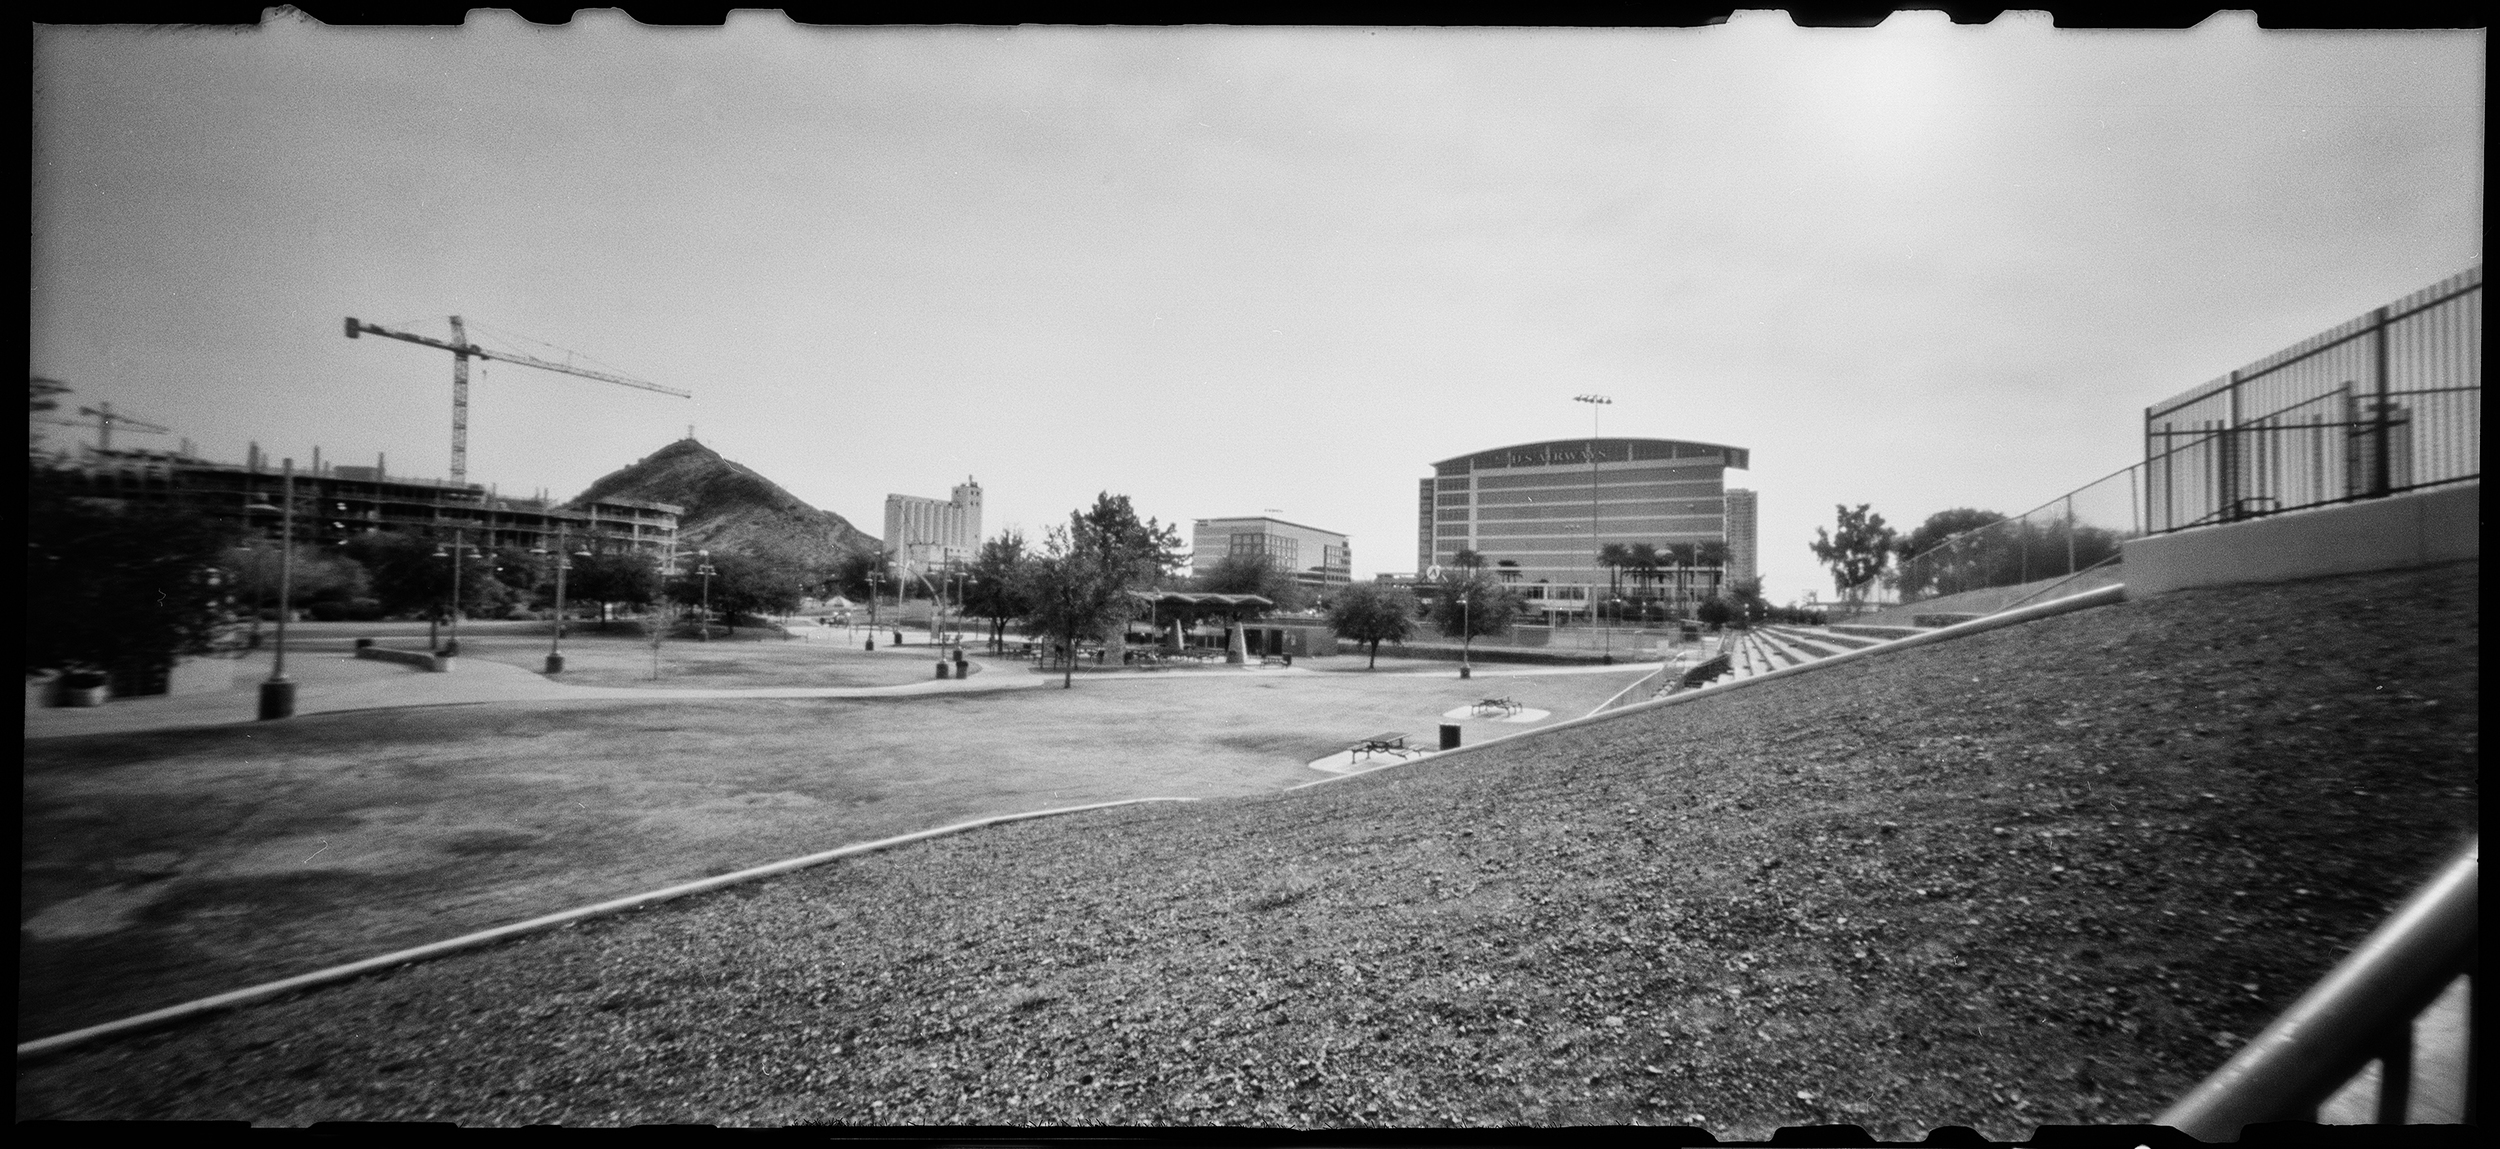 The Crane...The Park...Progress!